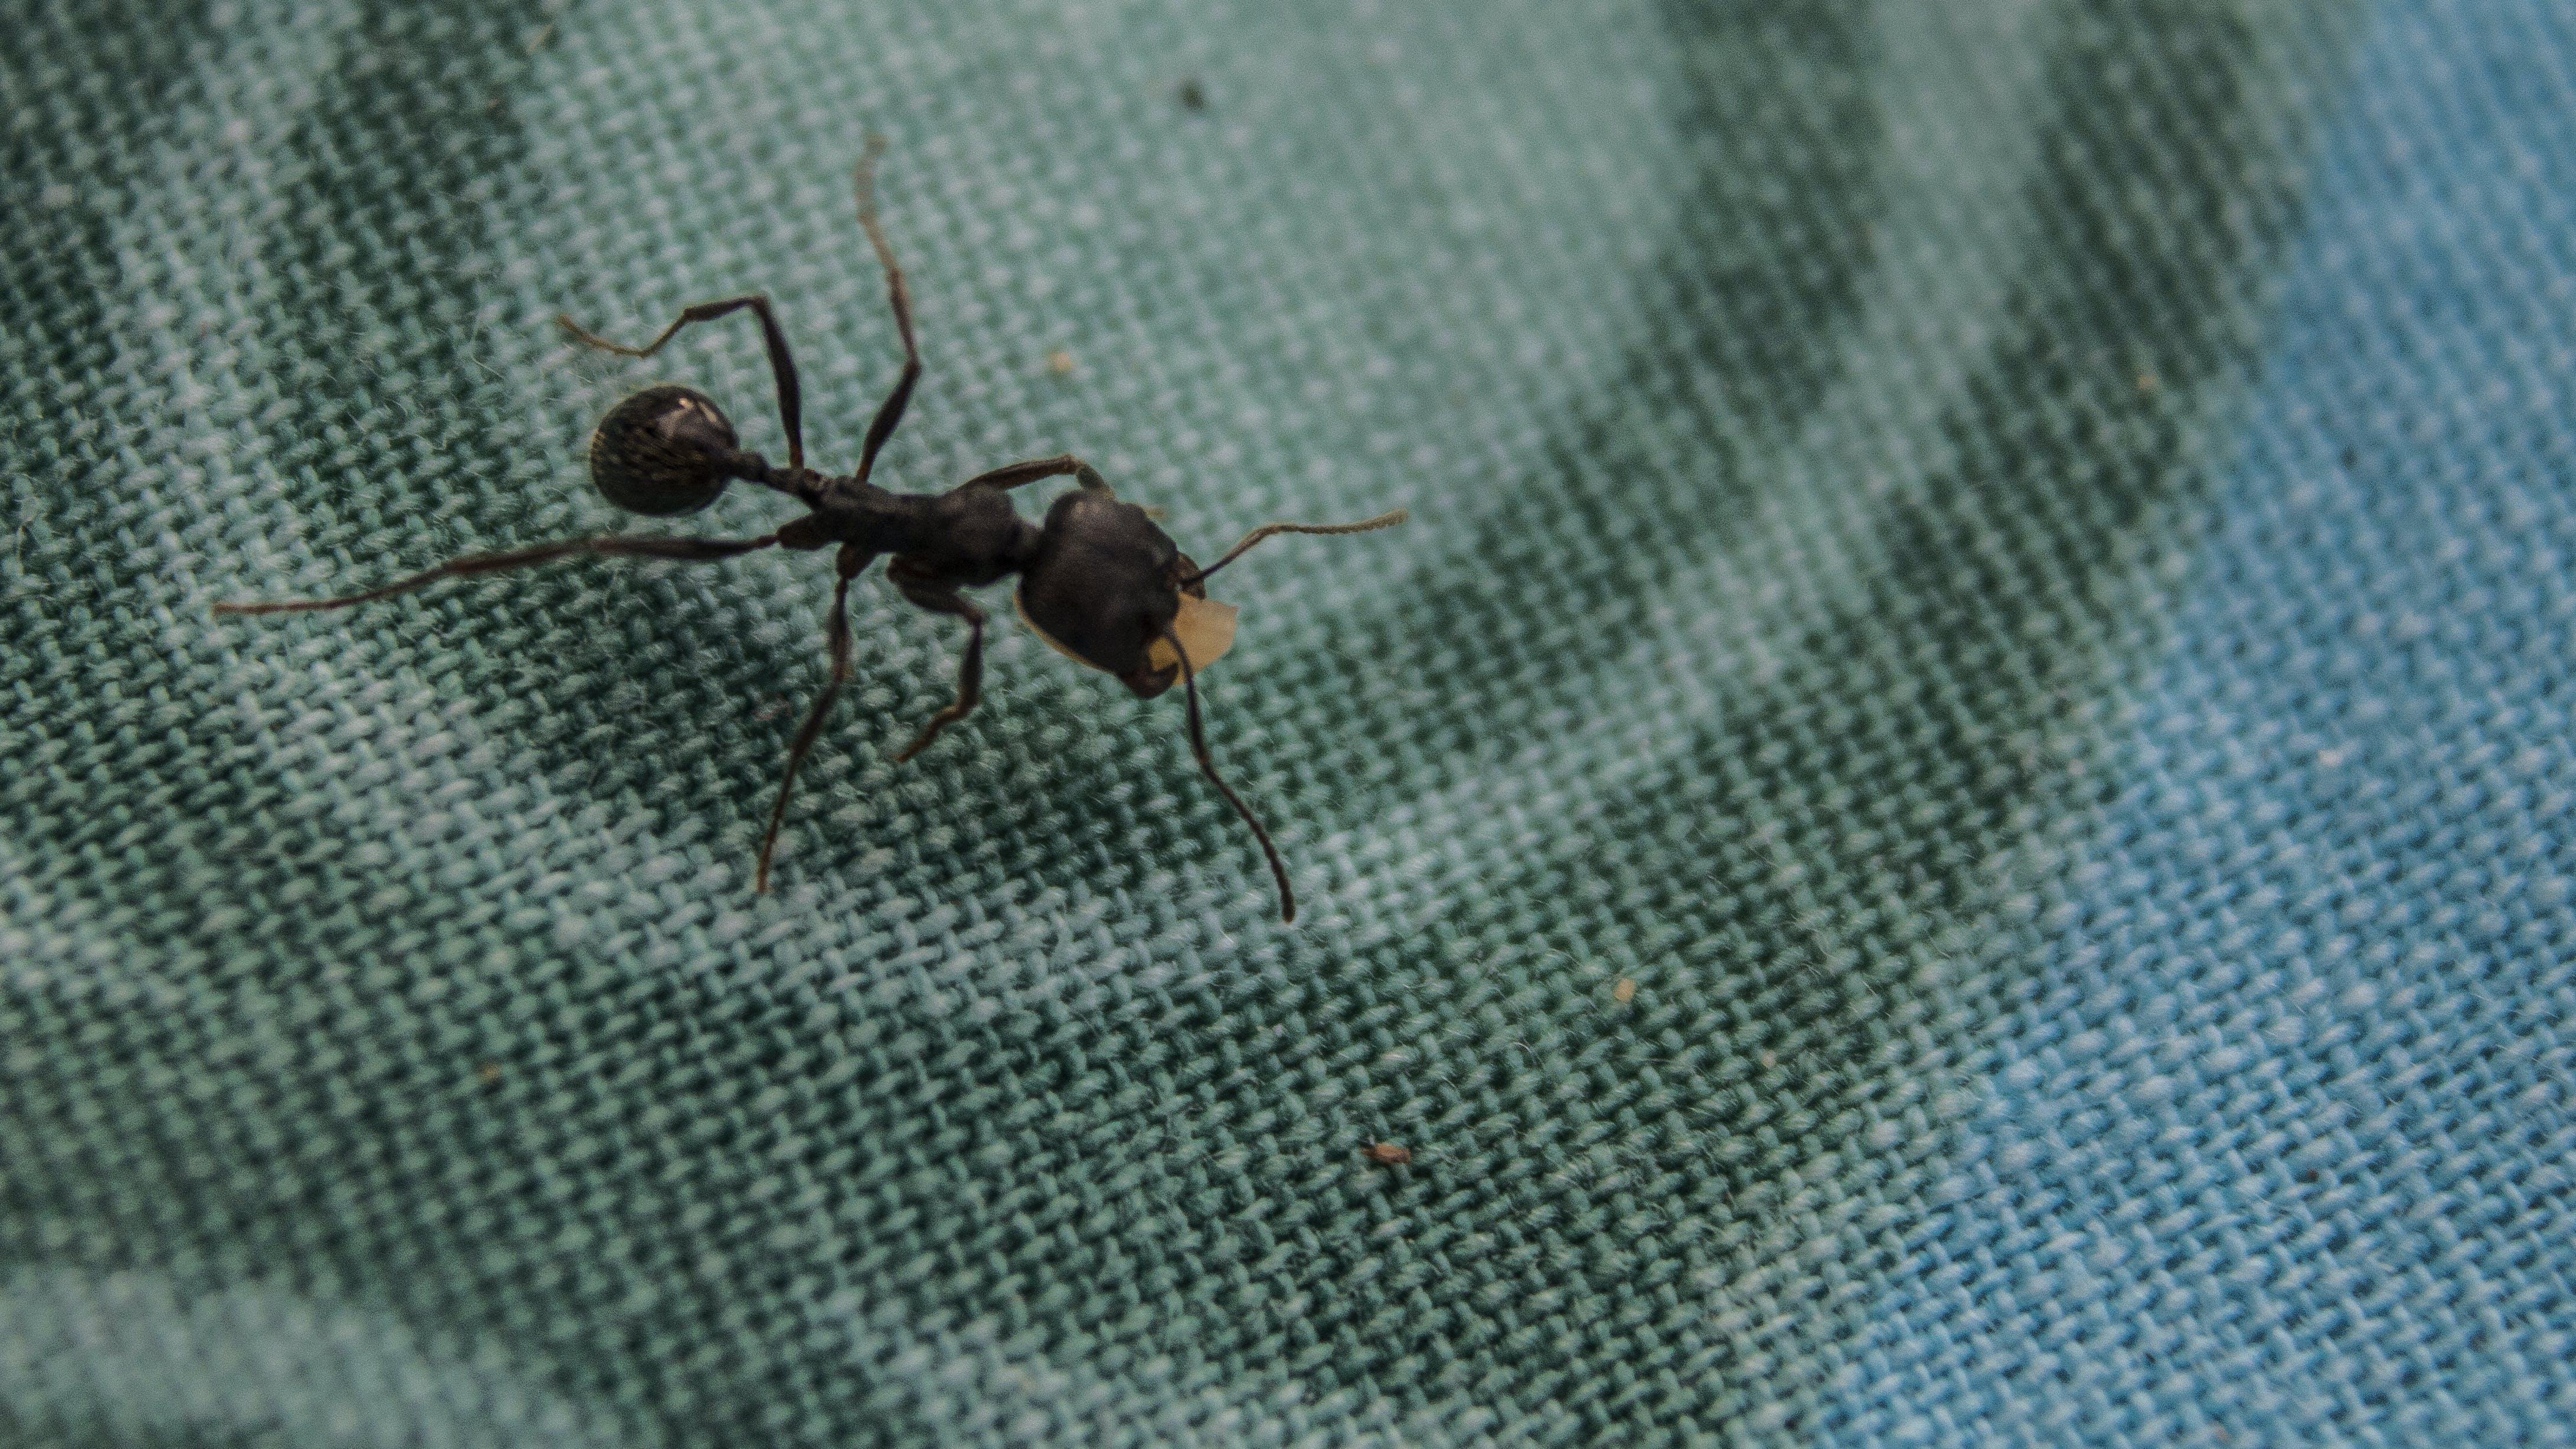 Free stock photo of picnic, animal, outdoor, bug